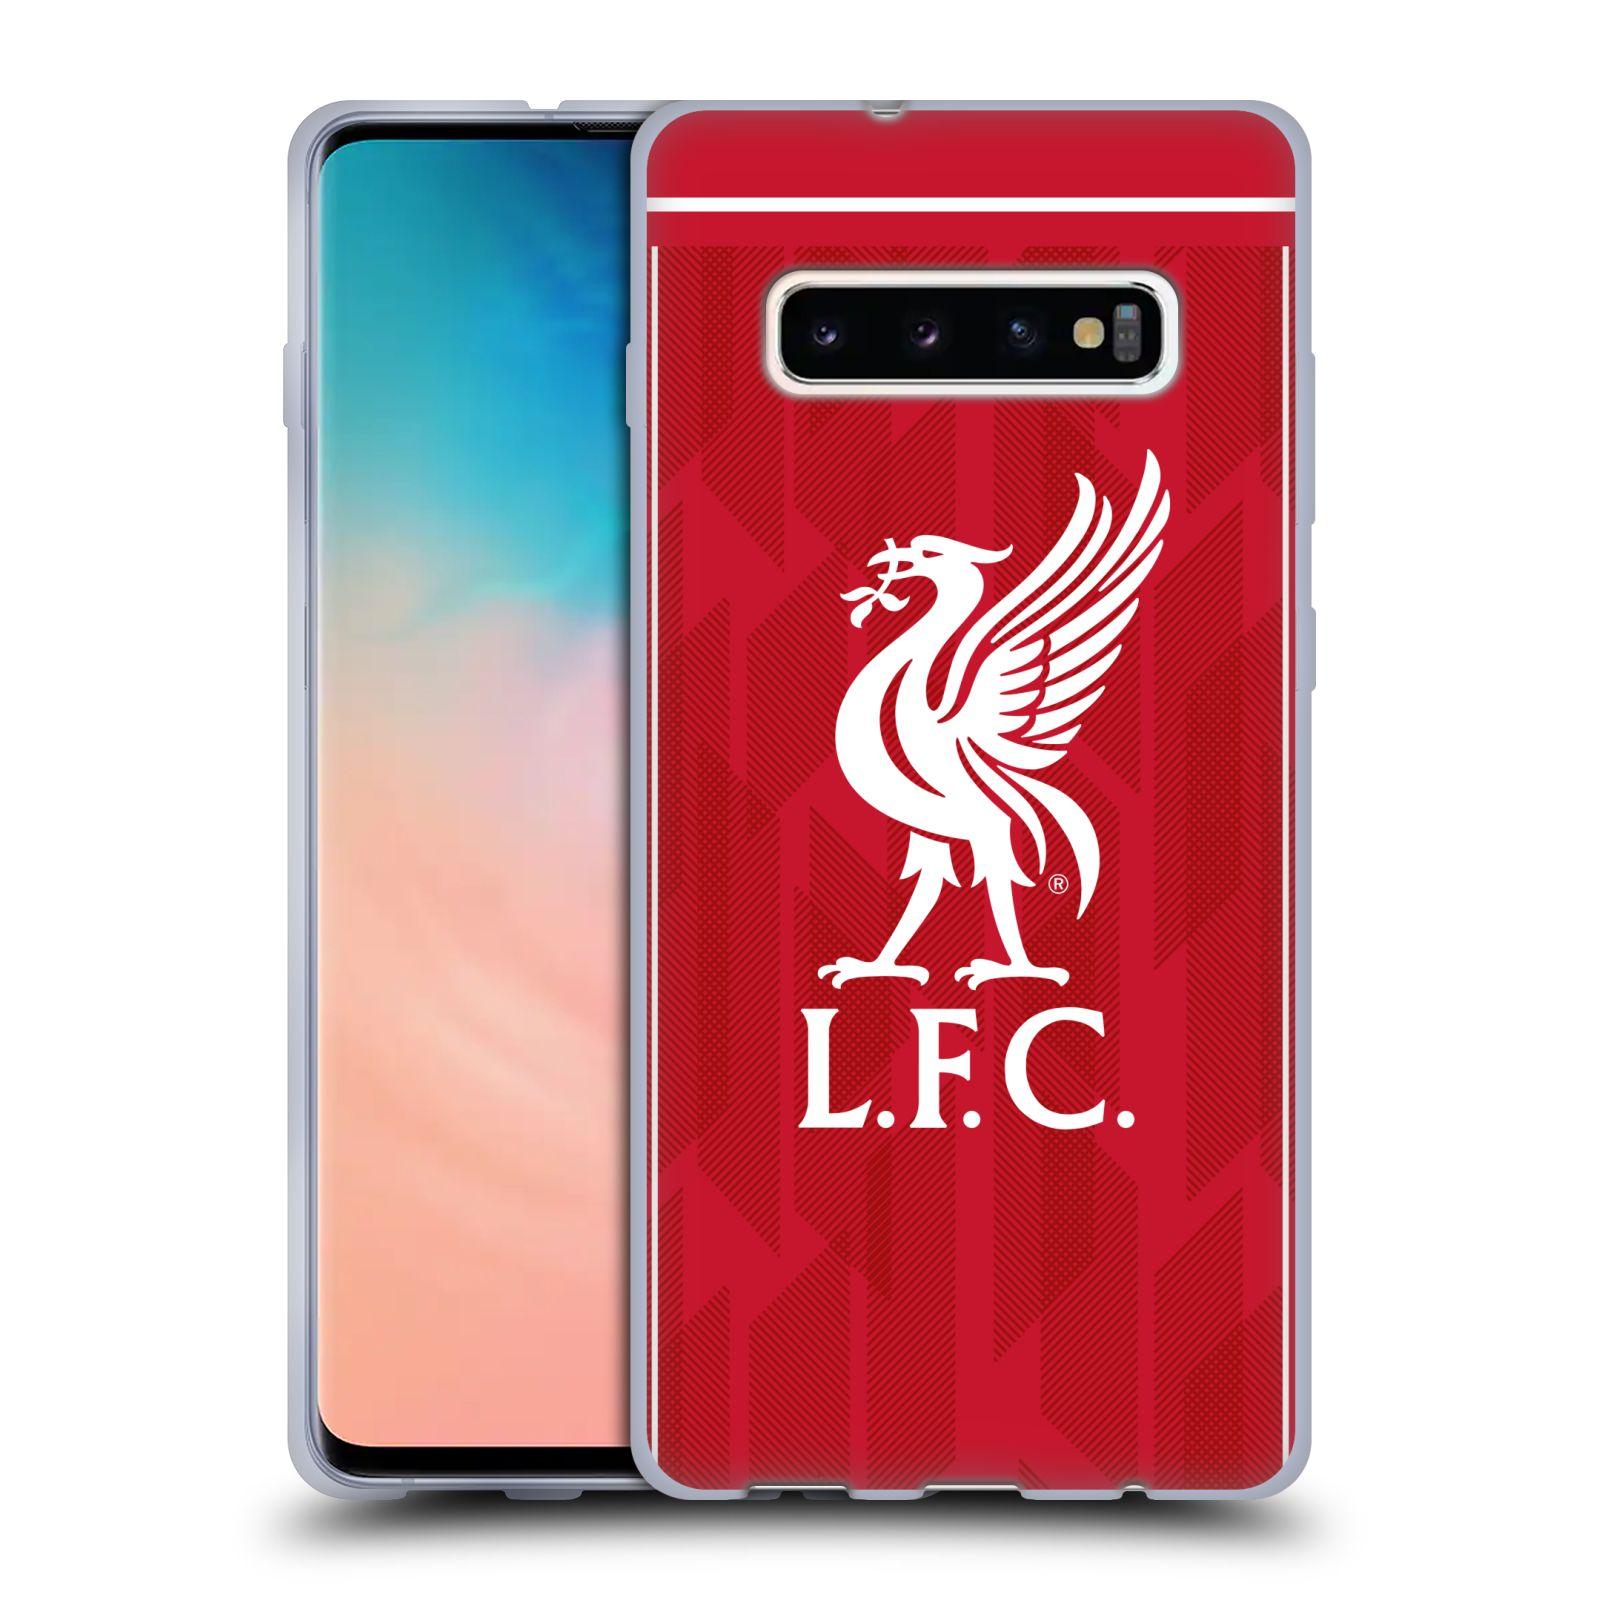 Silikonové pouzdro na mobil Samsung Galaxy S10 Plus - Head Case - Liverpool FC - L.F.C. Home kit